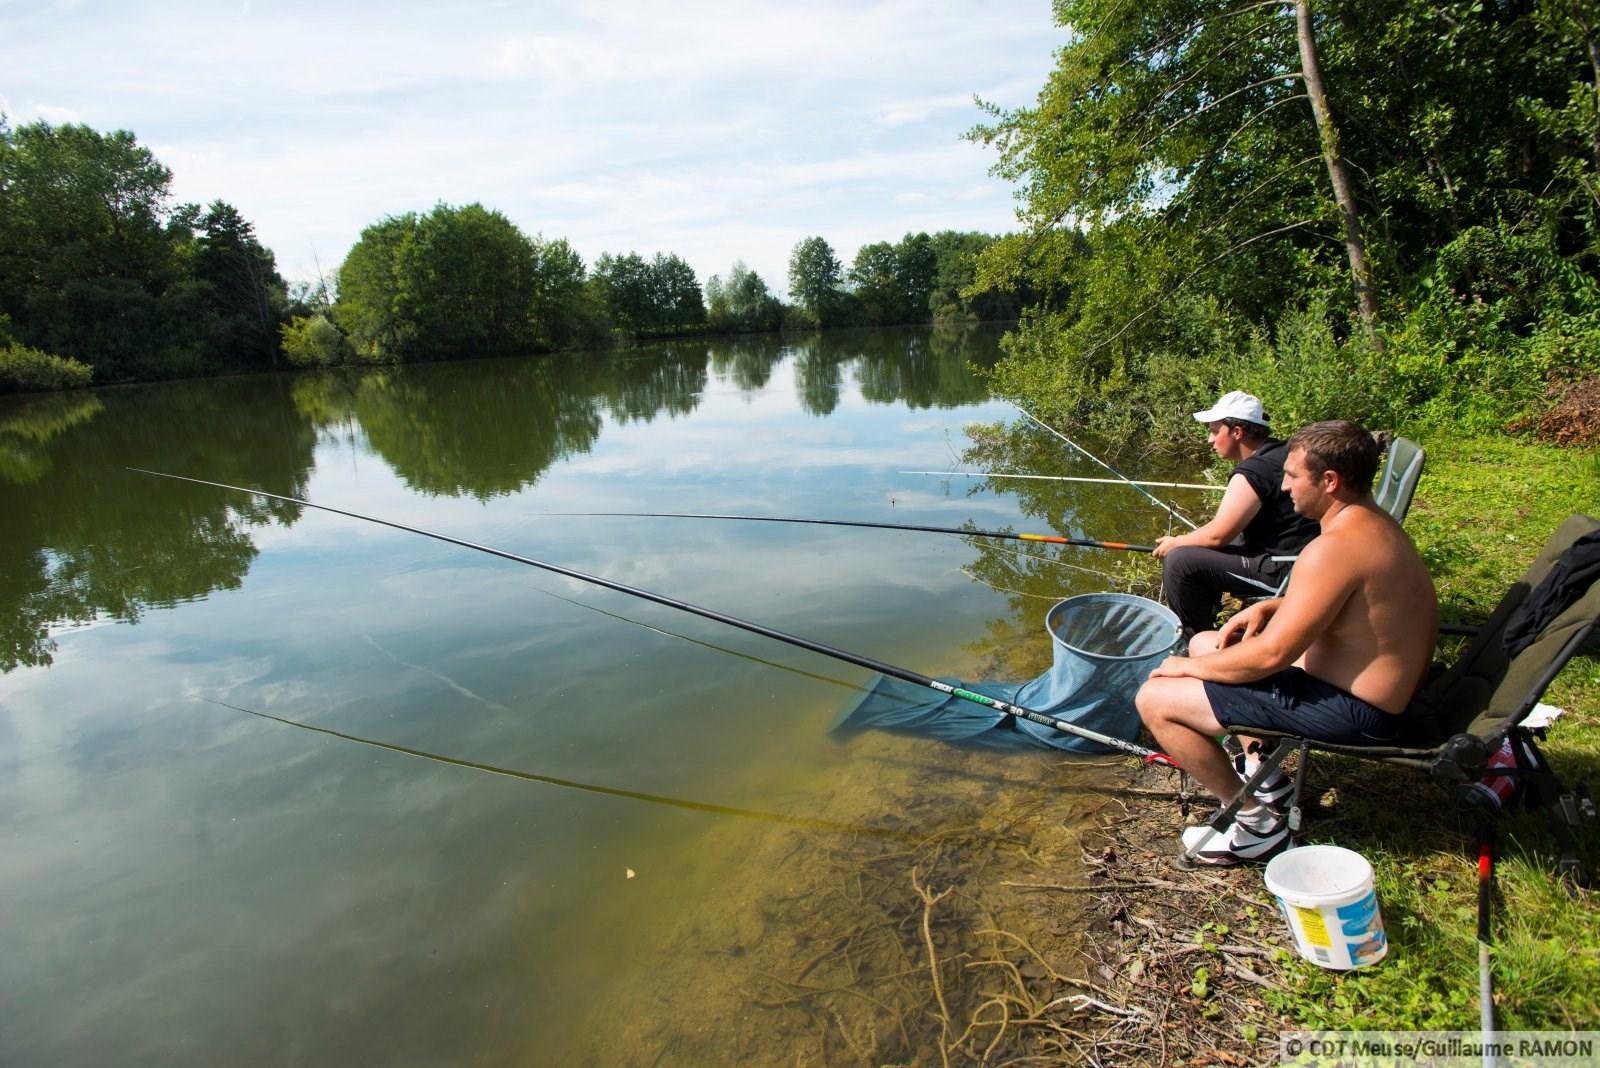 Pêche dans le fleuve Meuse - Guillaume Ramon